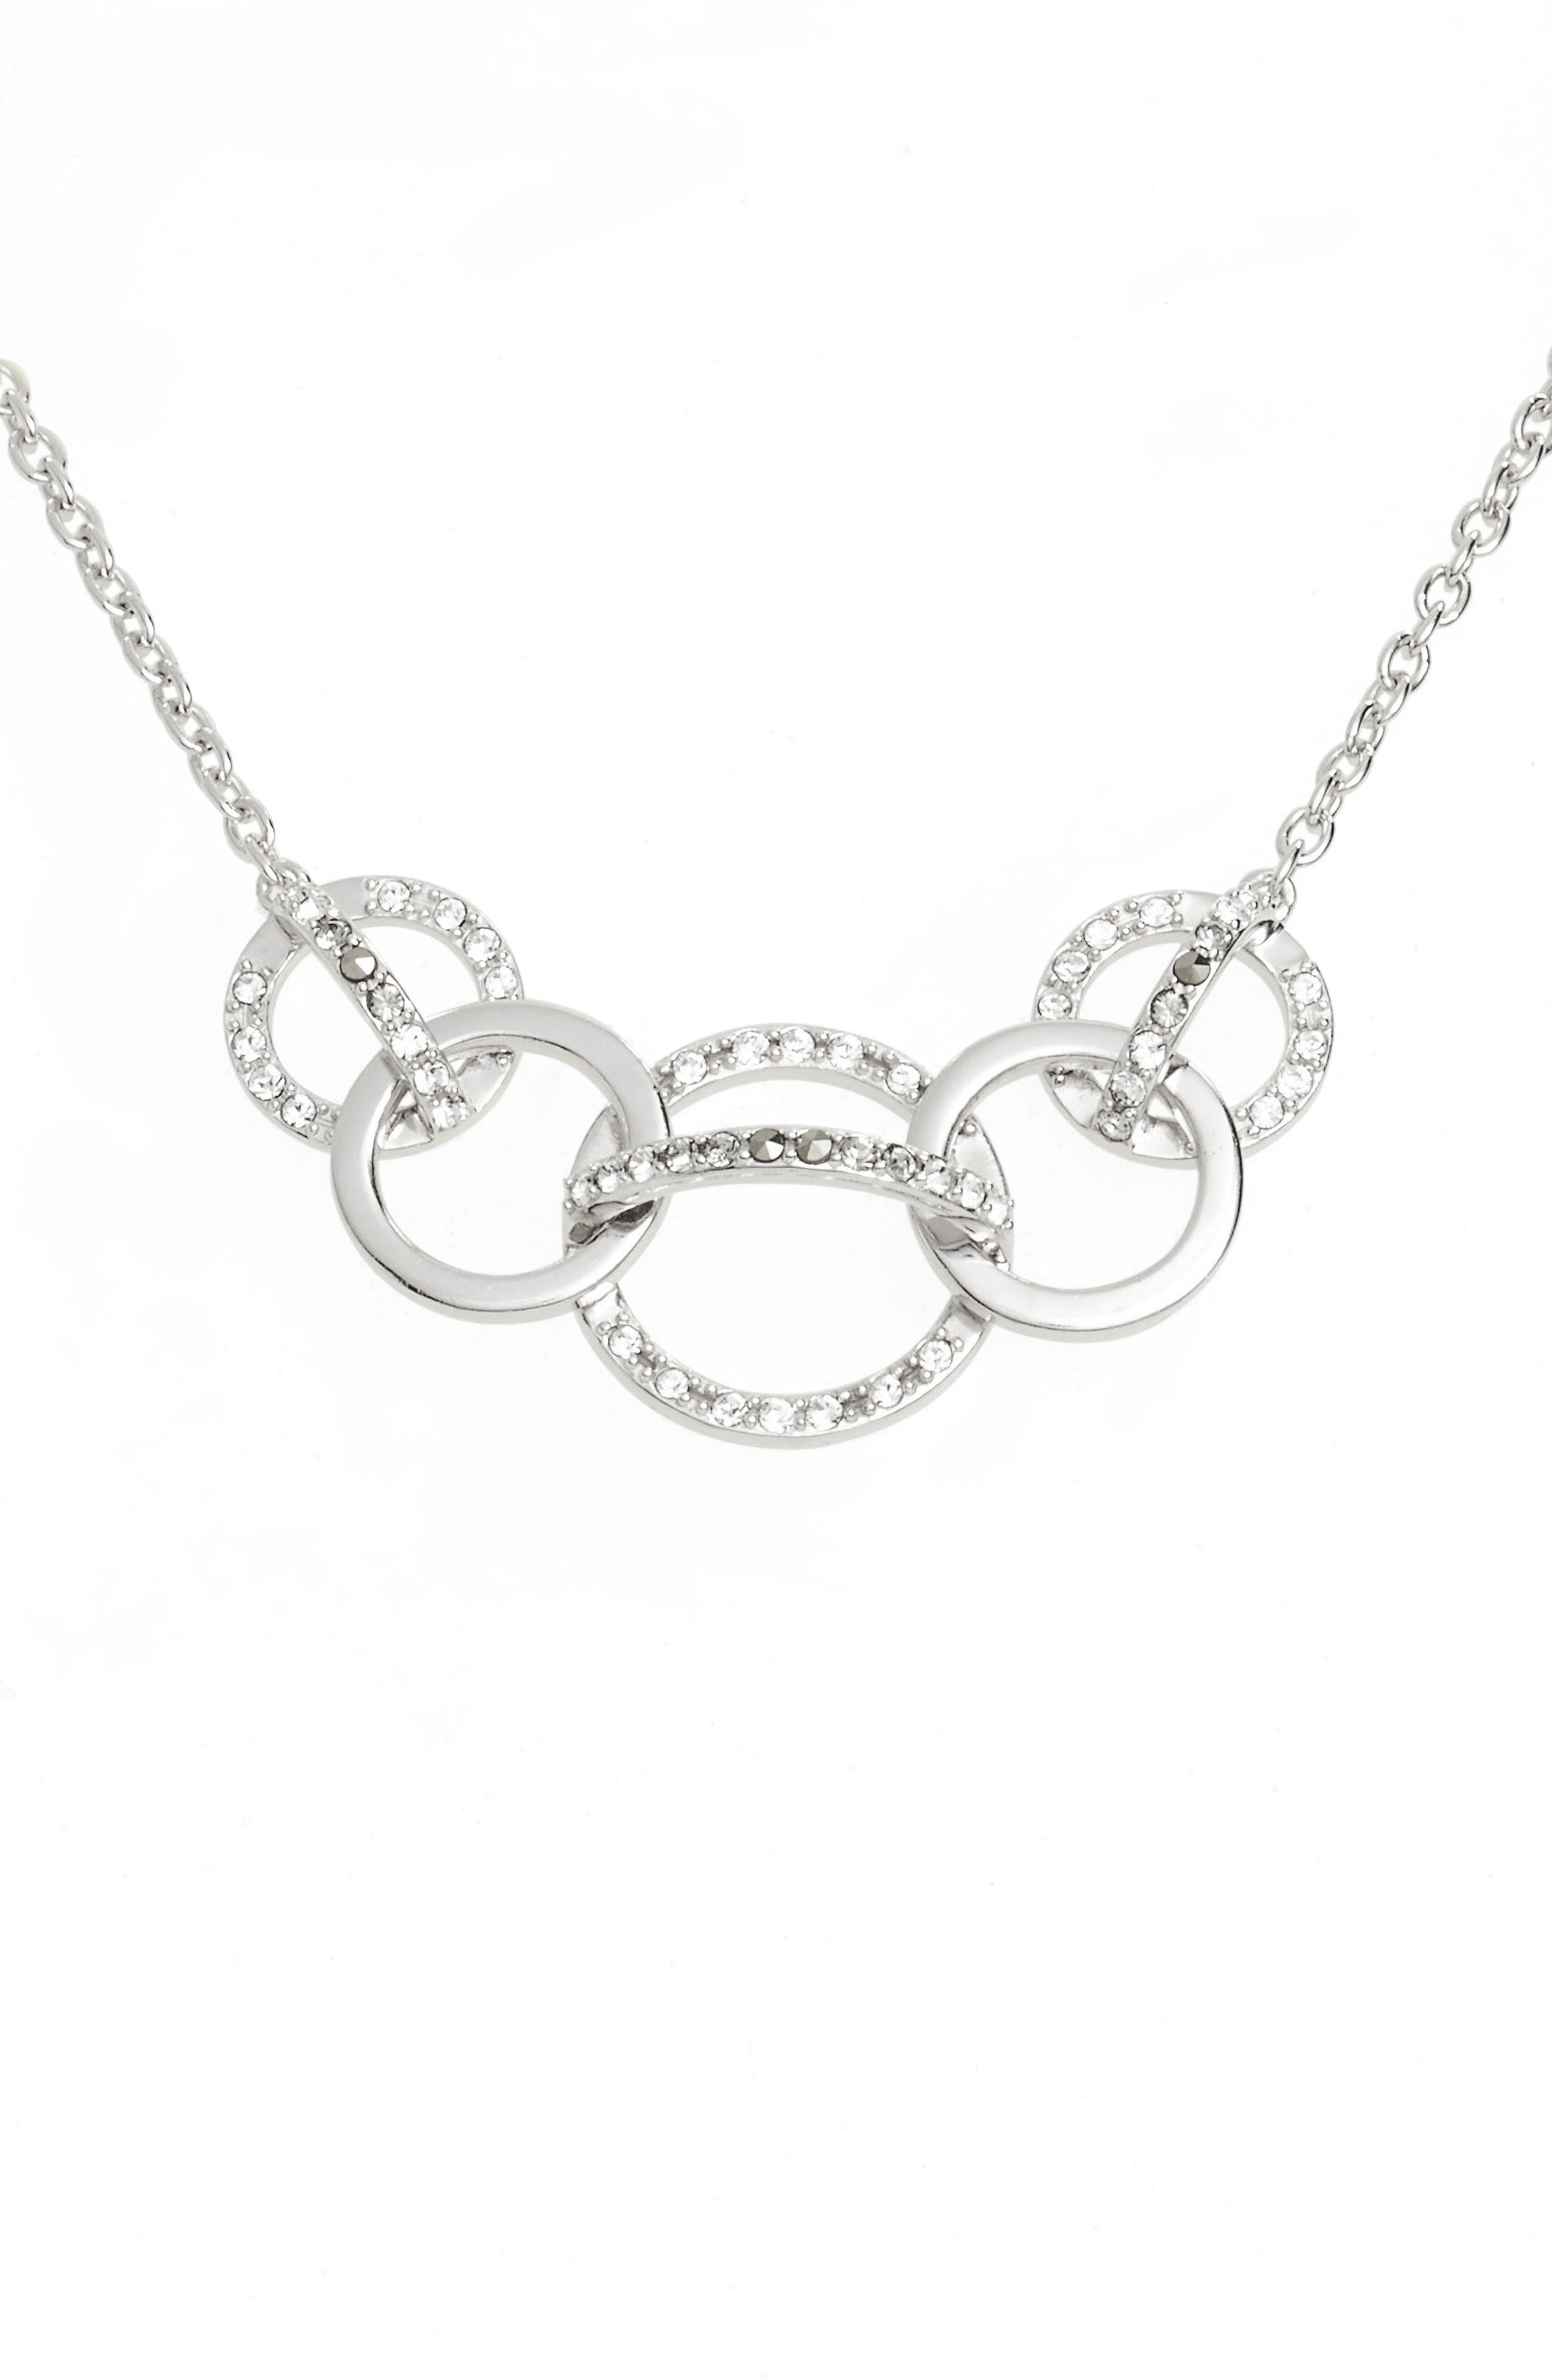 Silver Sparkle Crystal Collar Necklace,                         Main,                         color, 040